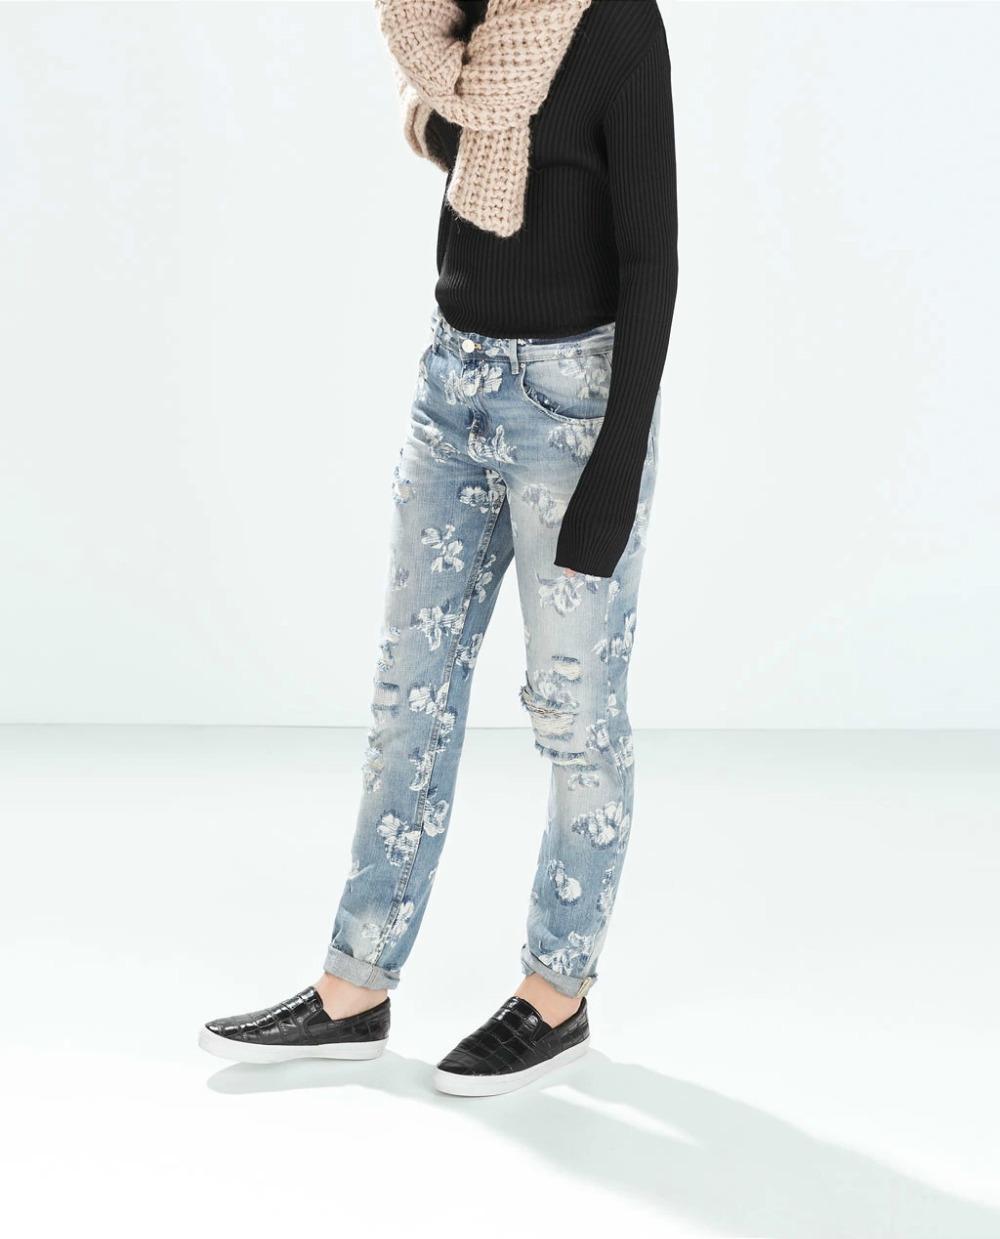 Fg12 Fashion Women Elegant Floral Print Holes Blue Denim Ripped Jeans Trouses Zipper Pockets Casual Slim Brand Skinny Pants